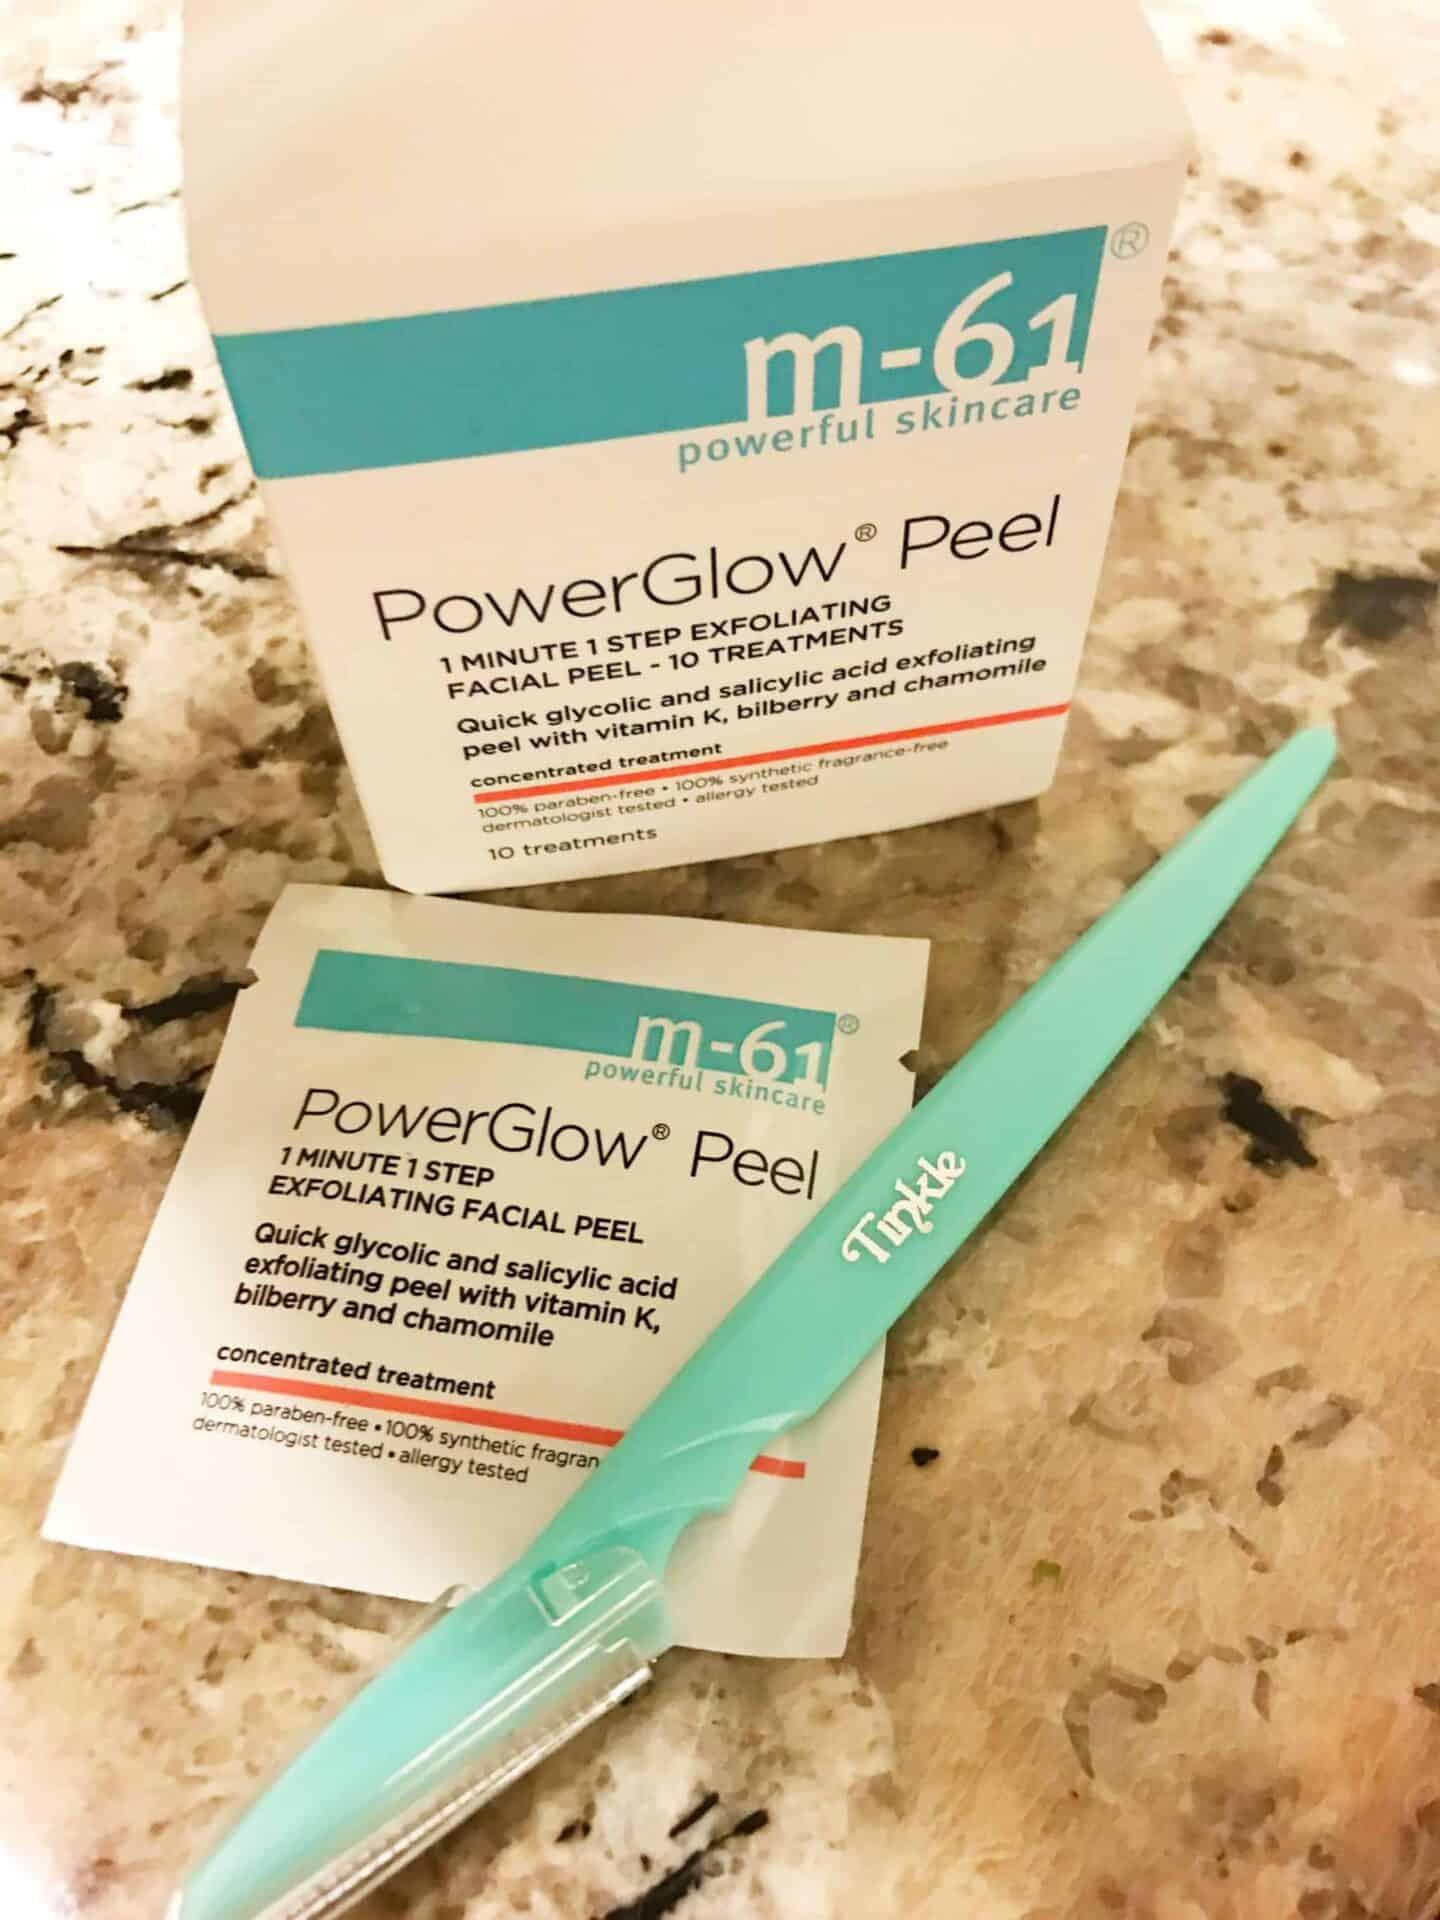 powerglow peel and tinkle razor